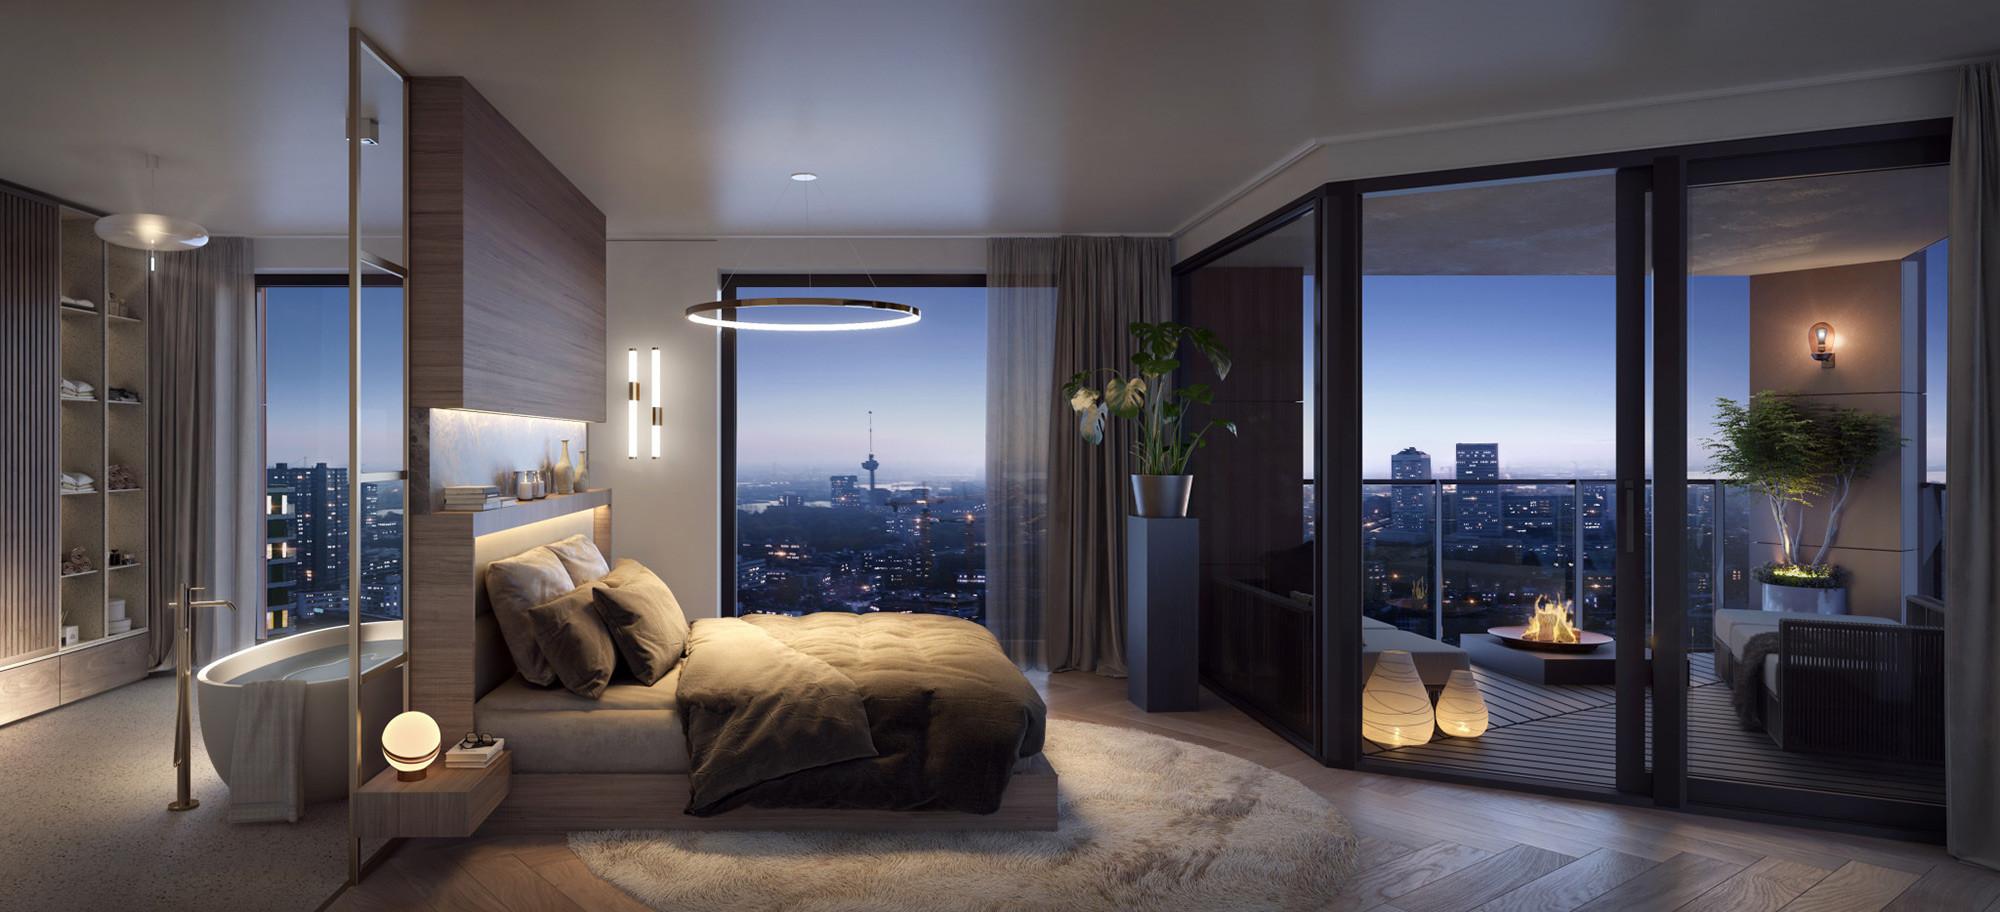 Int-16-Penthouse-bnr-216-master-bedroom